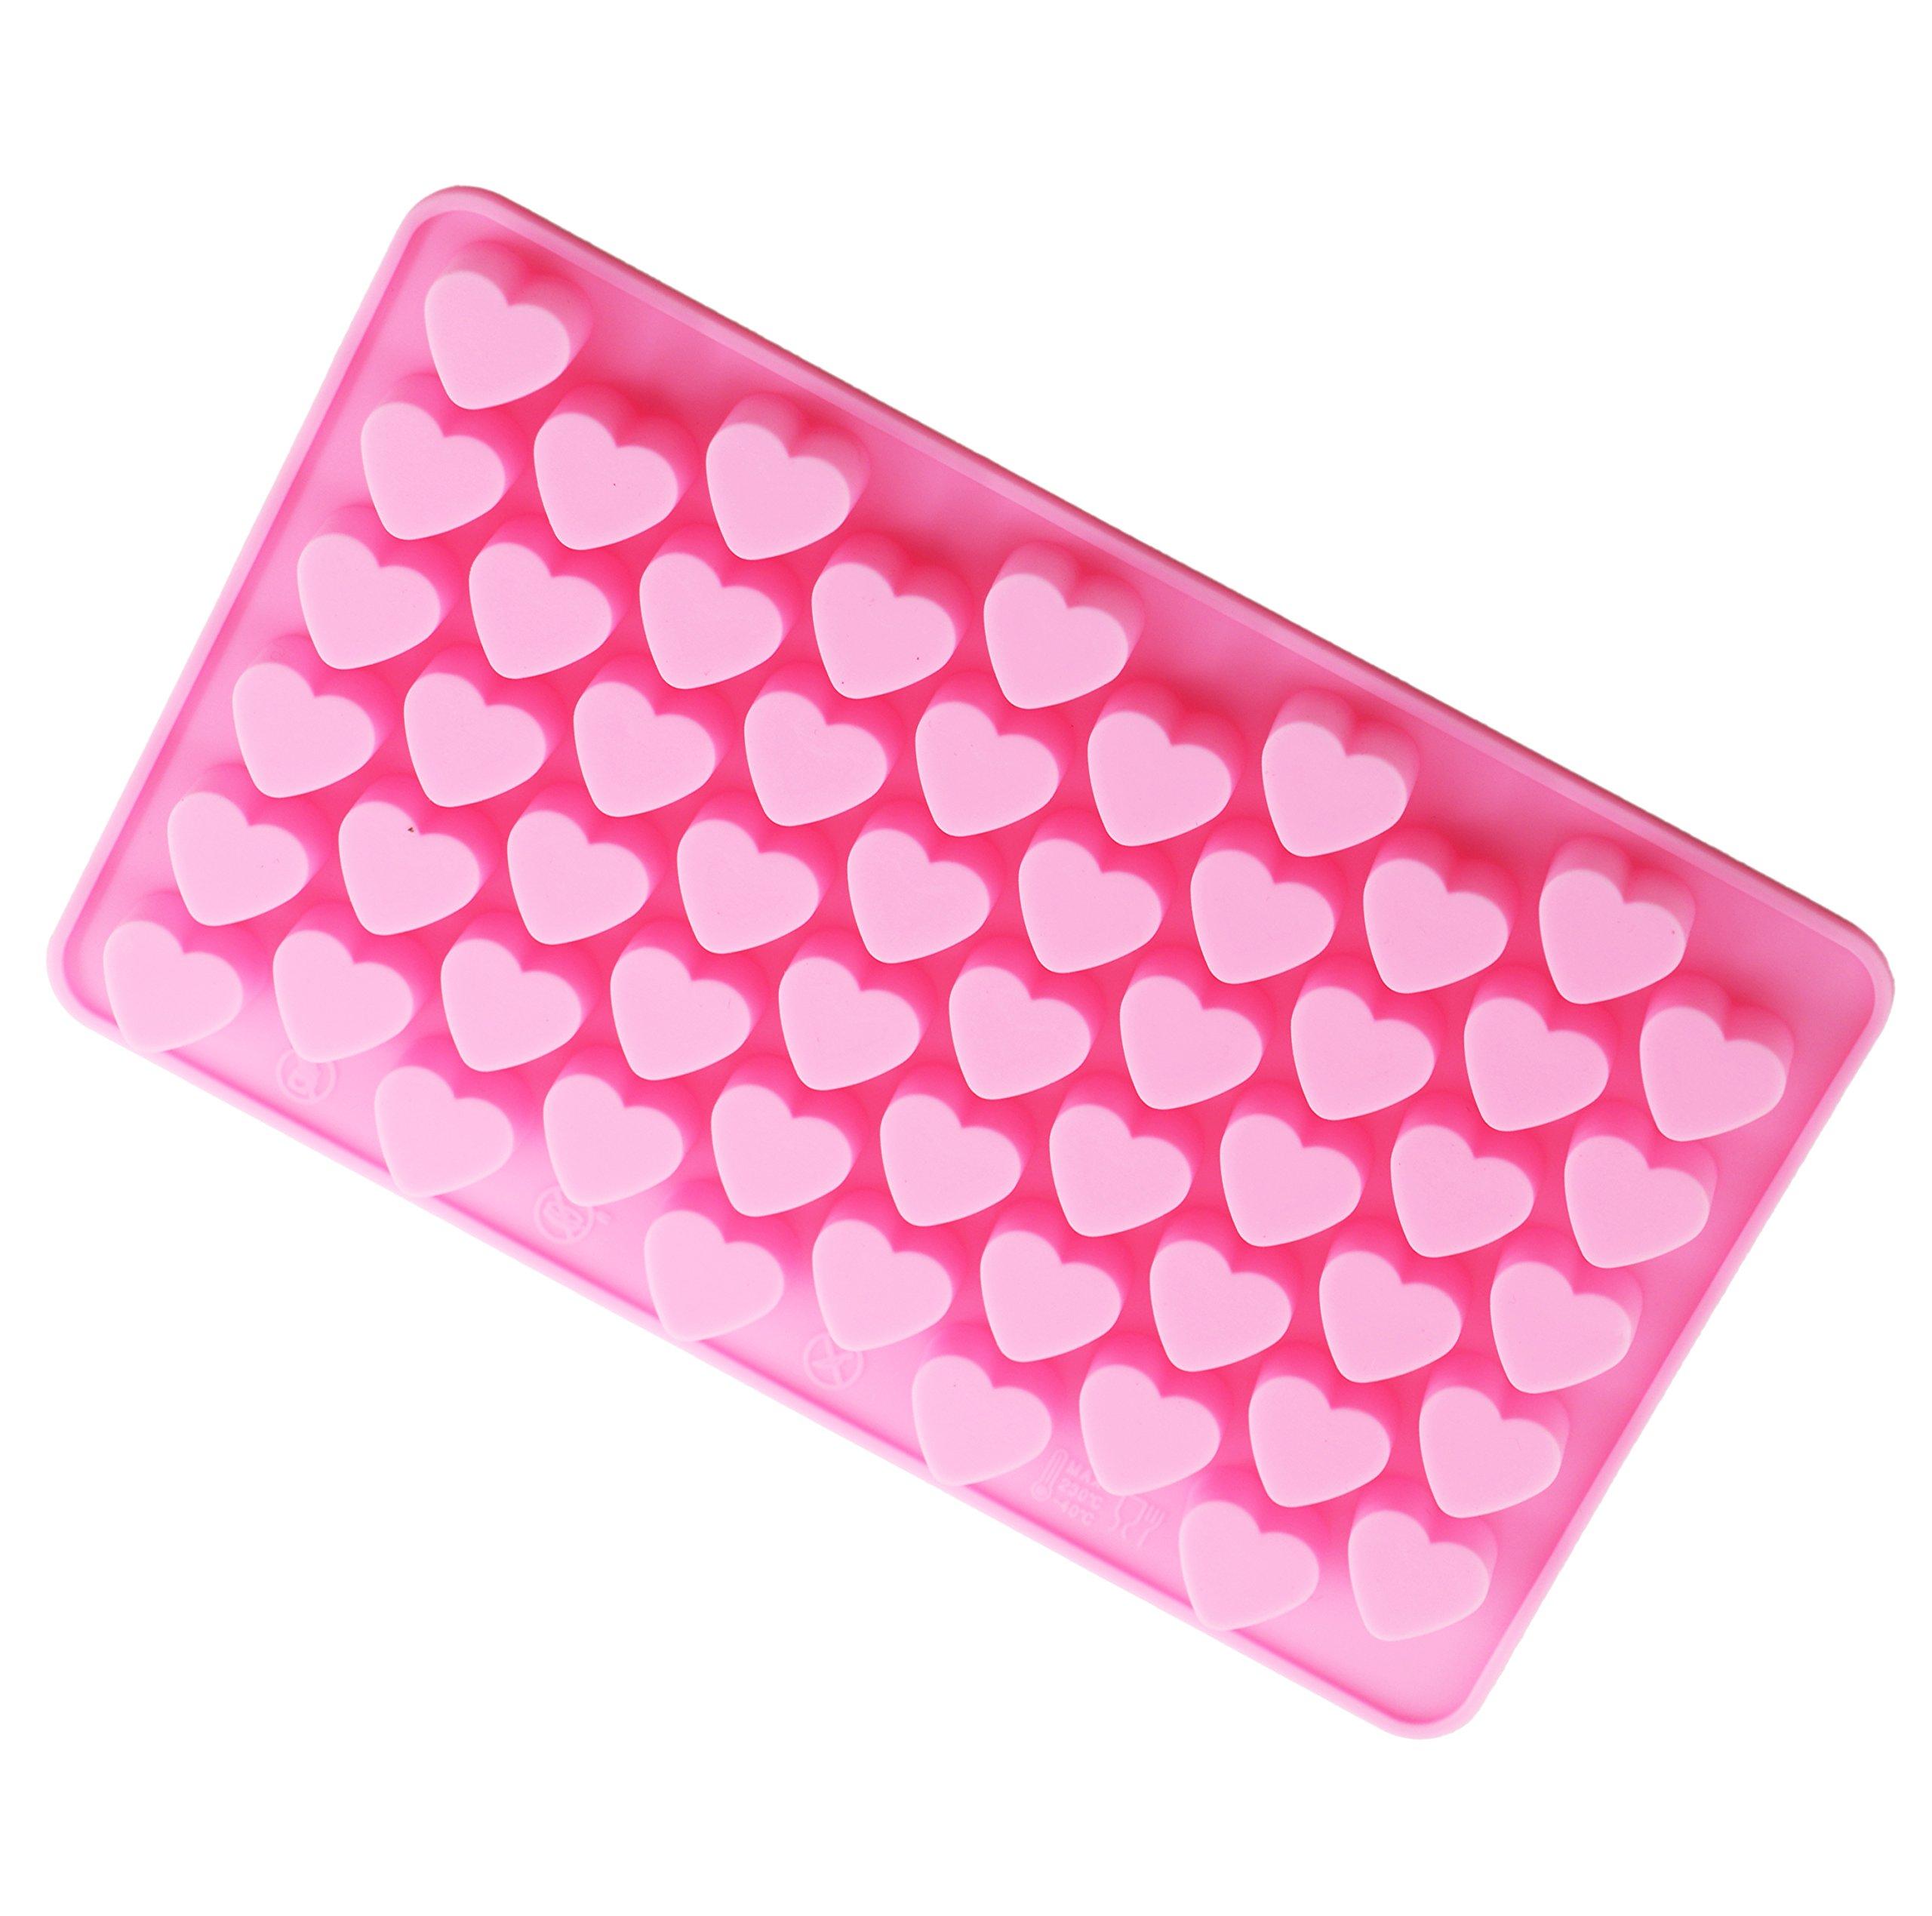 Bestjybt Silicone Mini Heart Shape Silicone Ice Cube Candy Mold Chocolate Mold